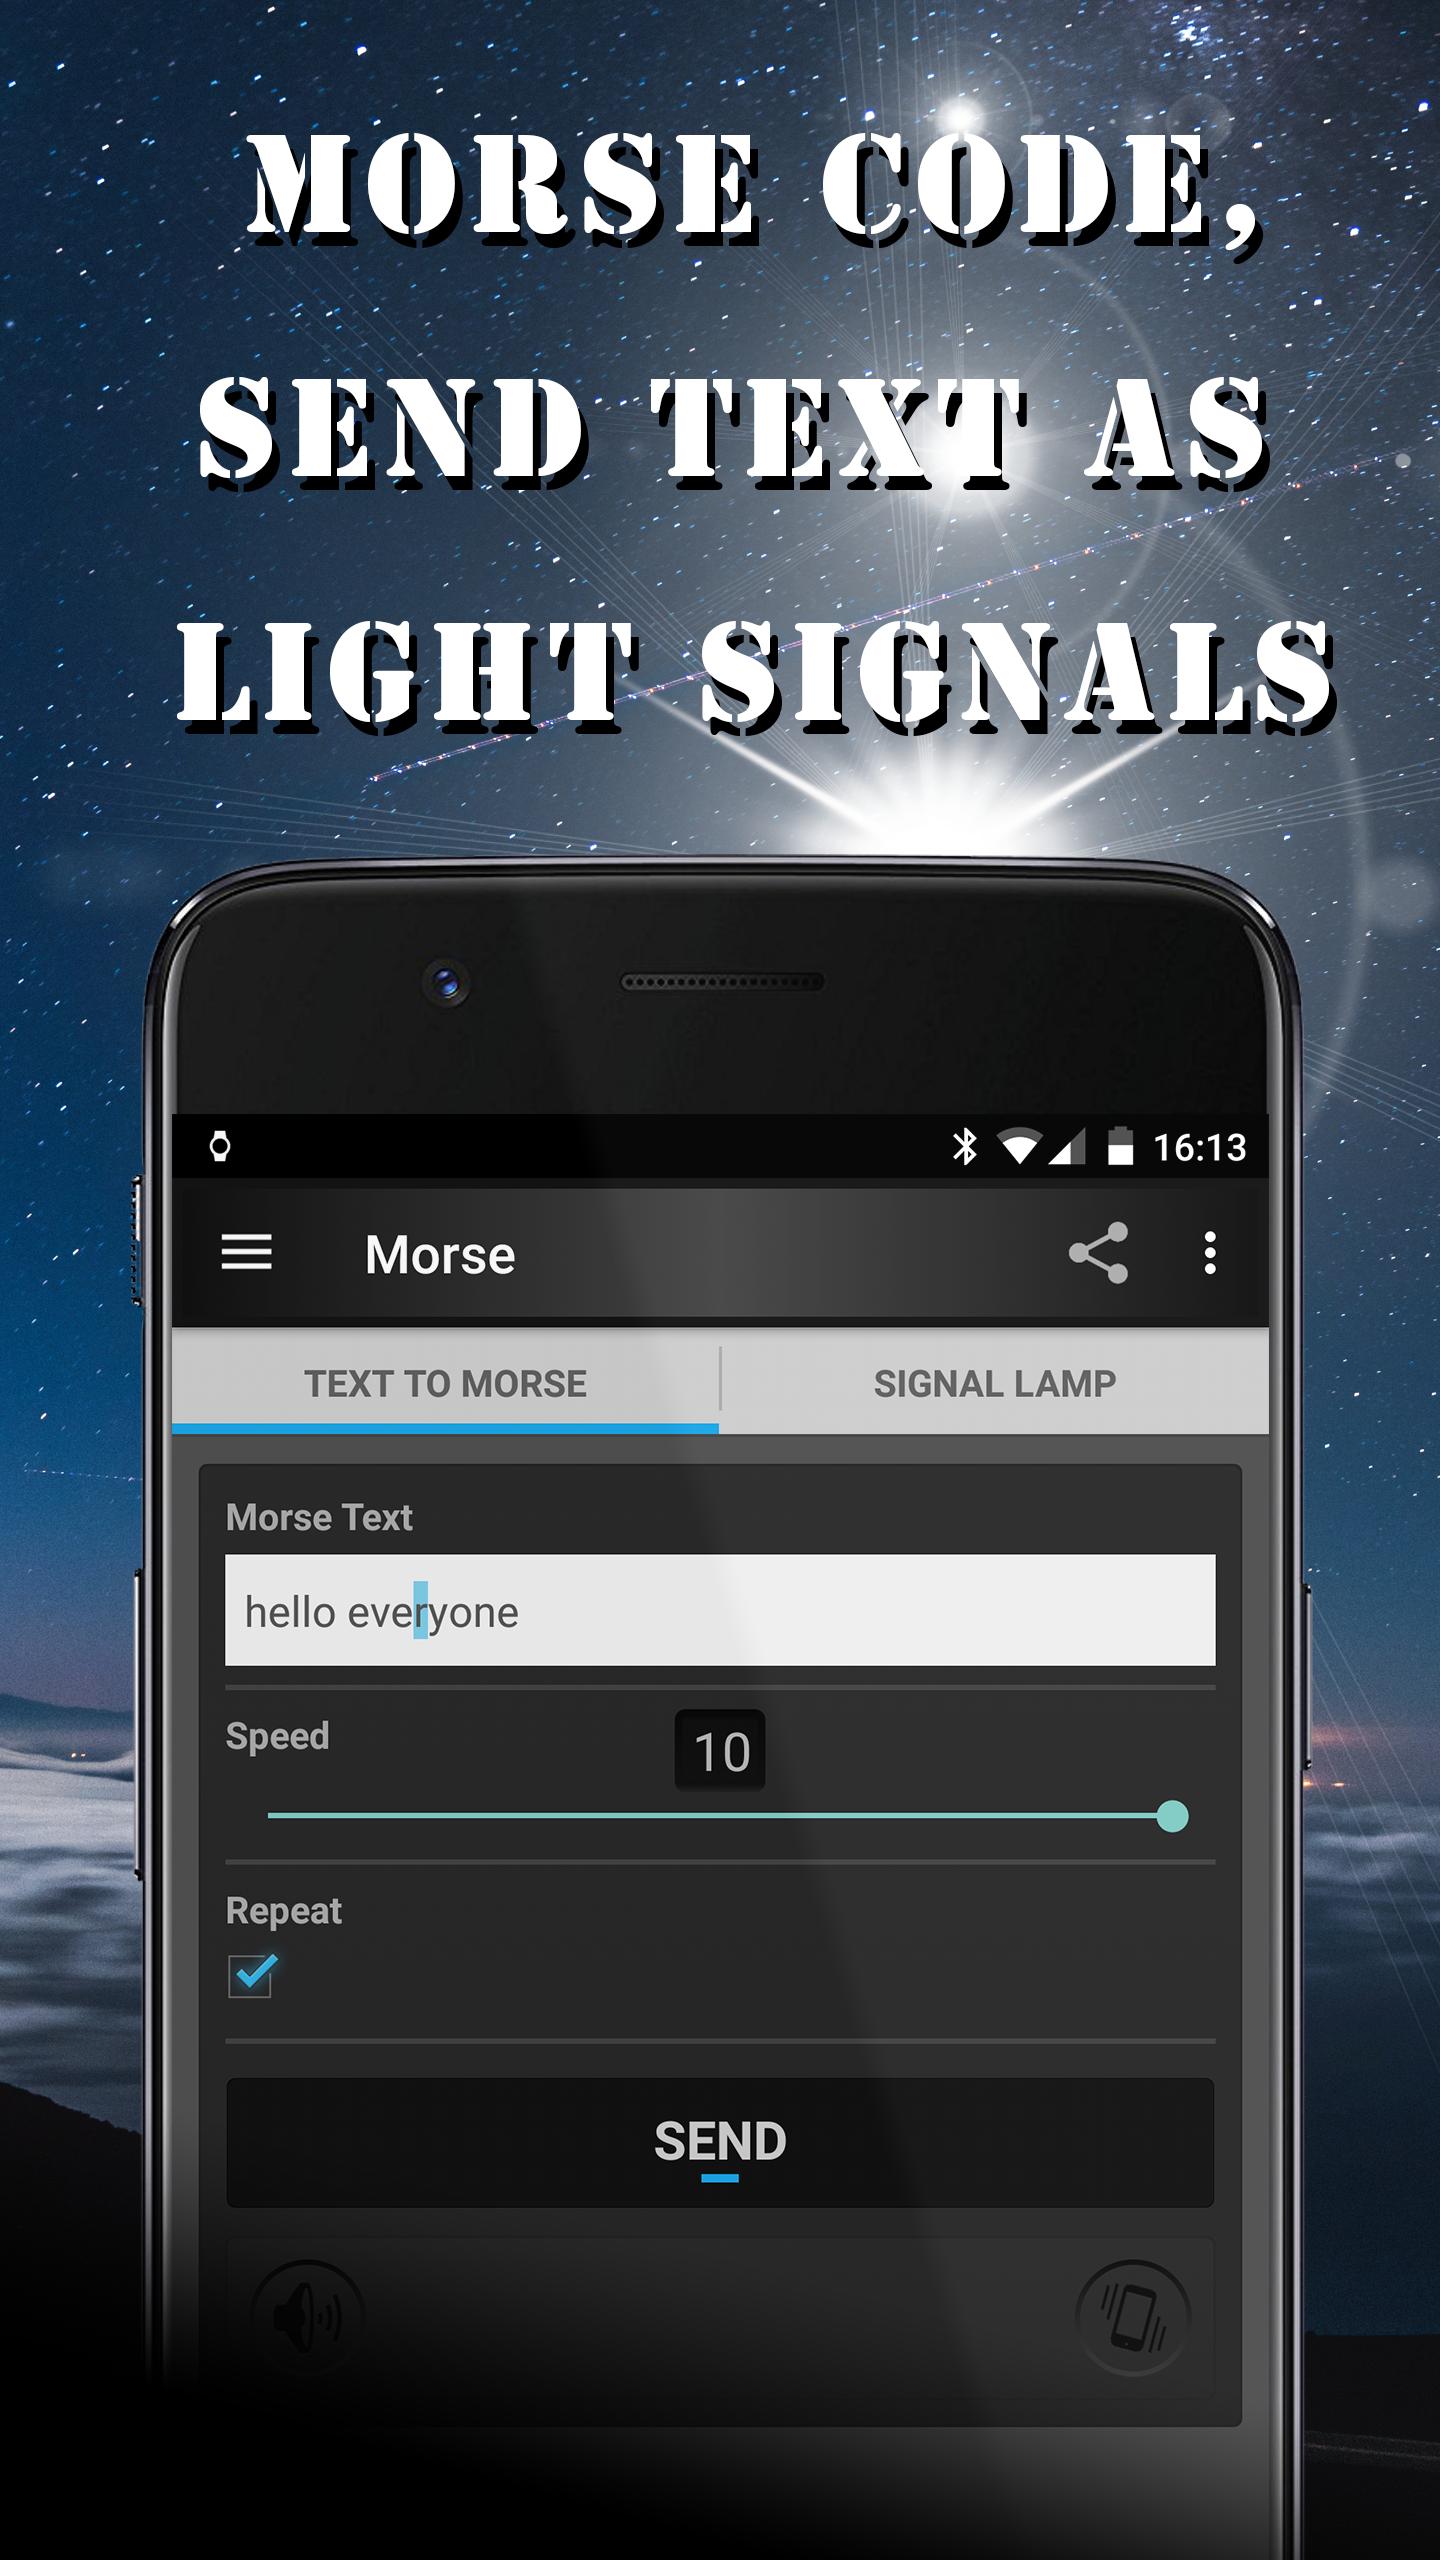 morse code, send text as light signals